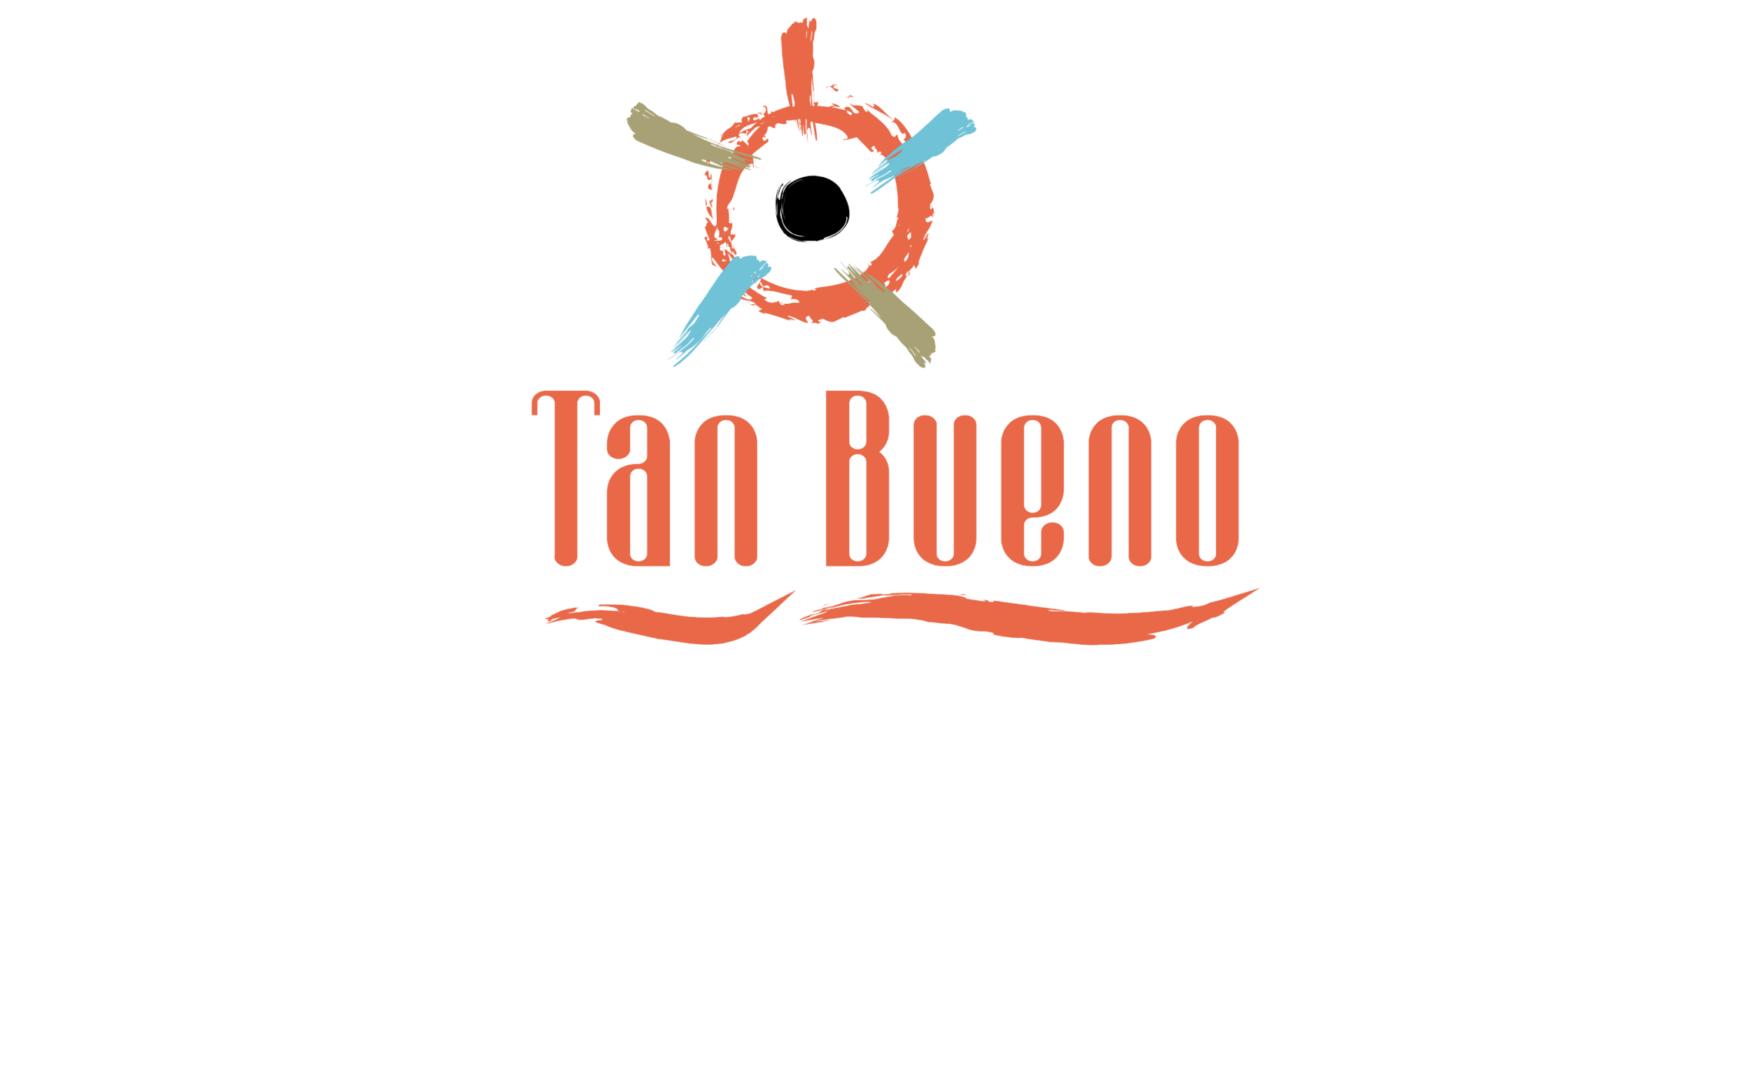 tan-bueno-logo-full-colour-rgb-for-website-01-e1603211505974